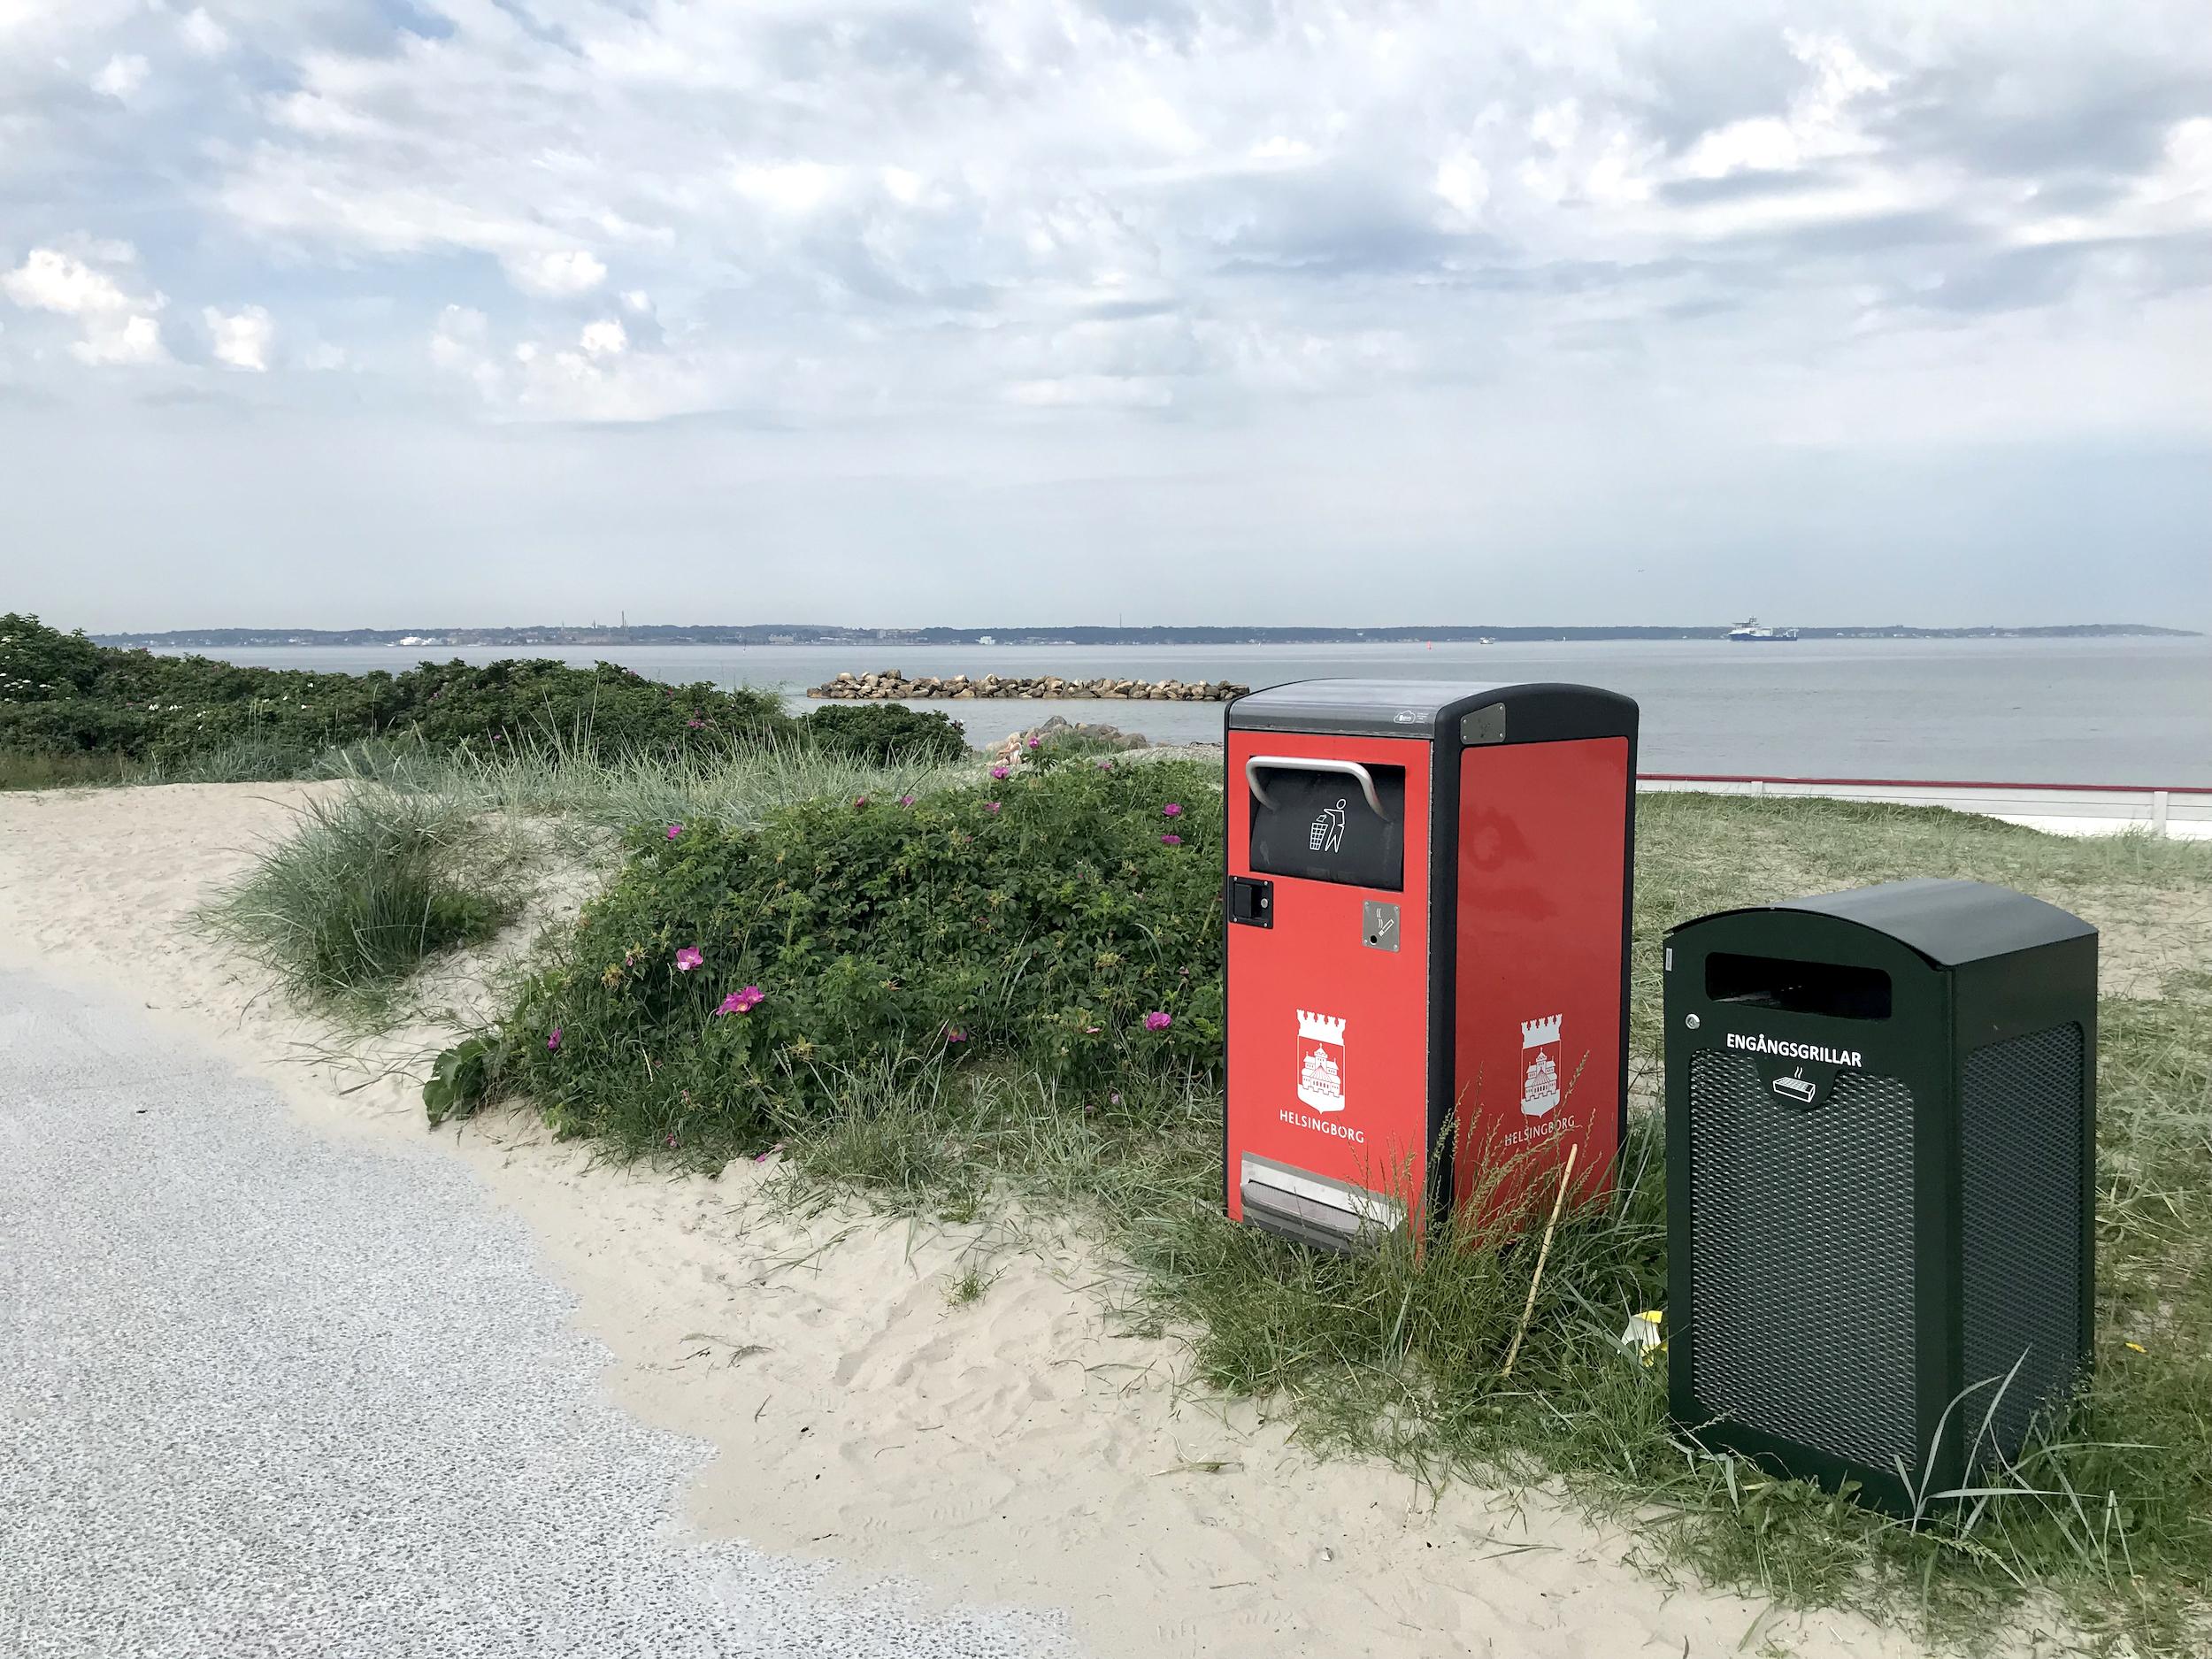 Smart trash cans in Helsingborg